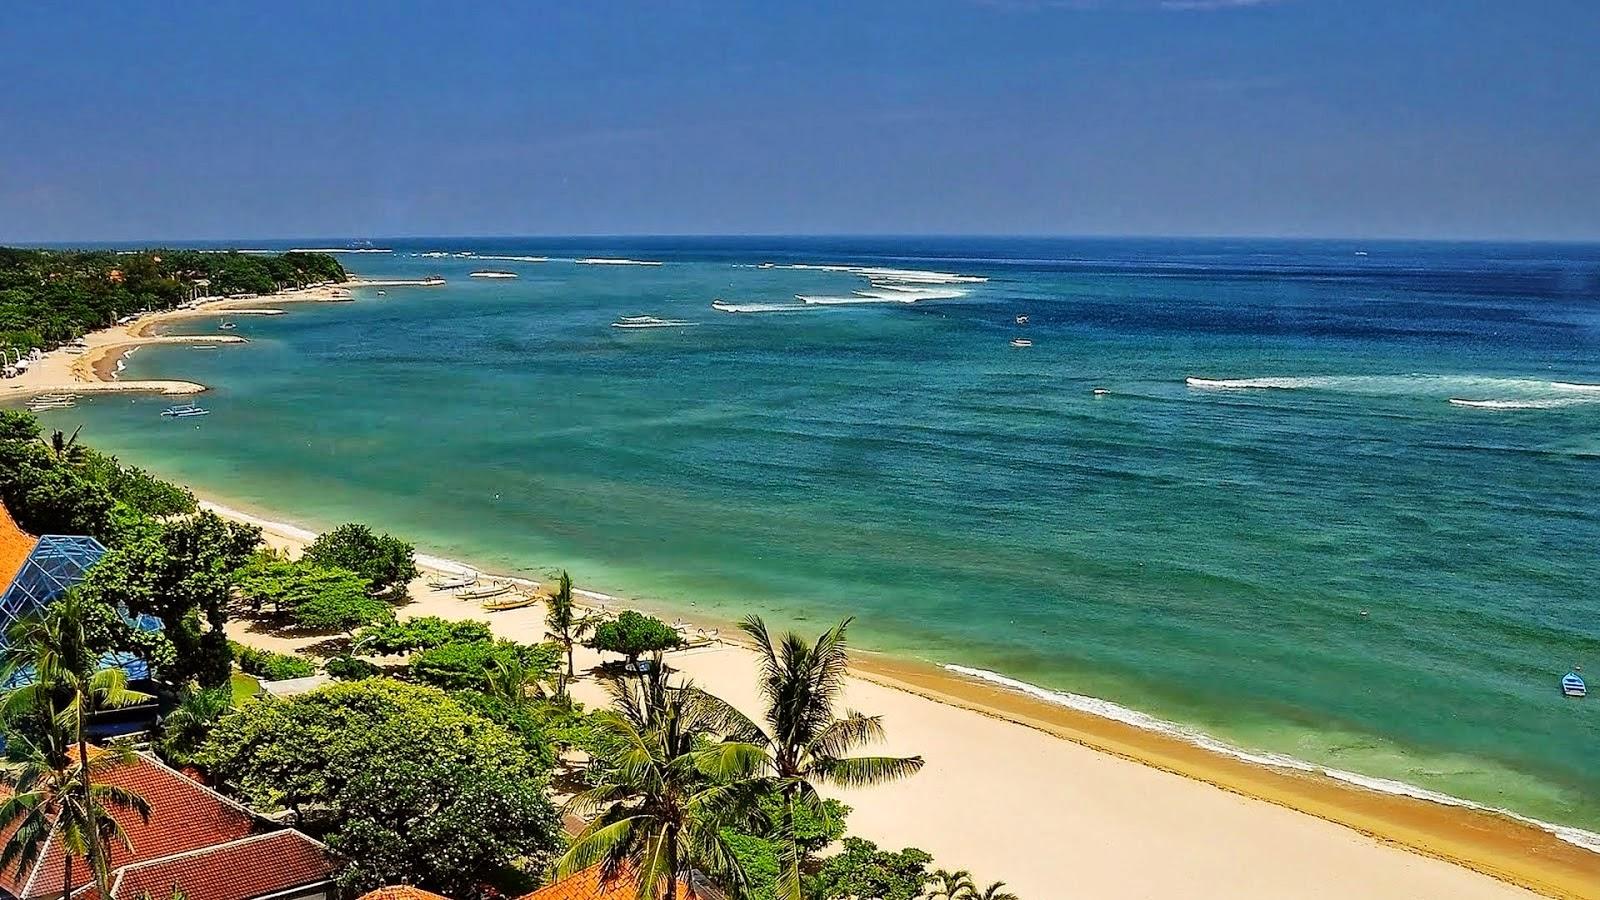 KUMPULAN GAMBAR PANTAI DI BALI INDAH Foto Pemandangan Pantai